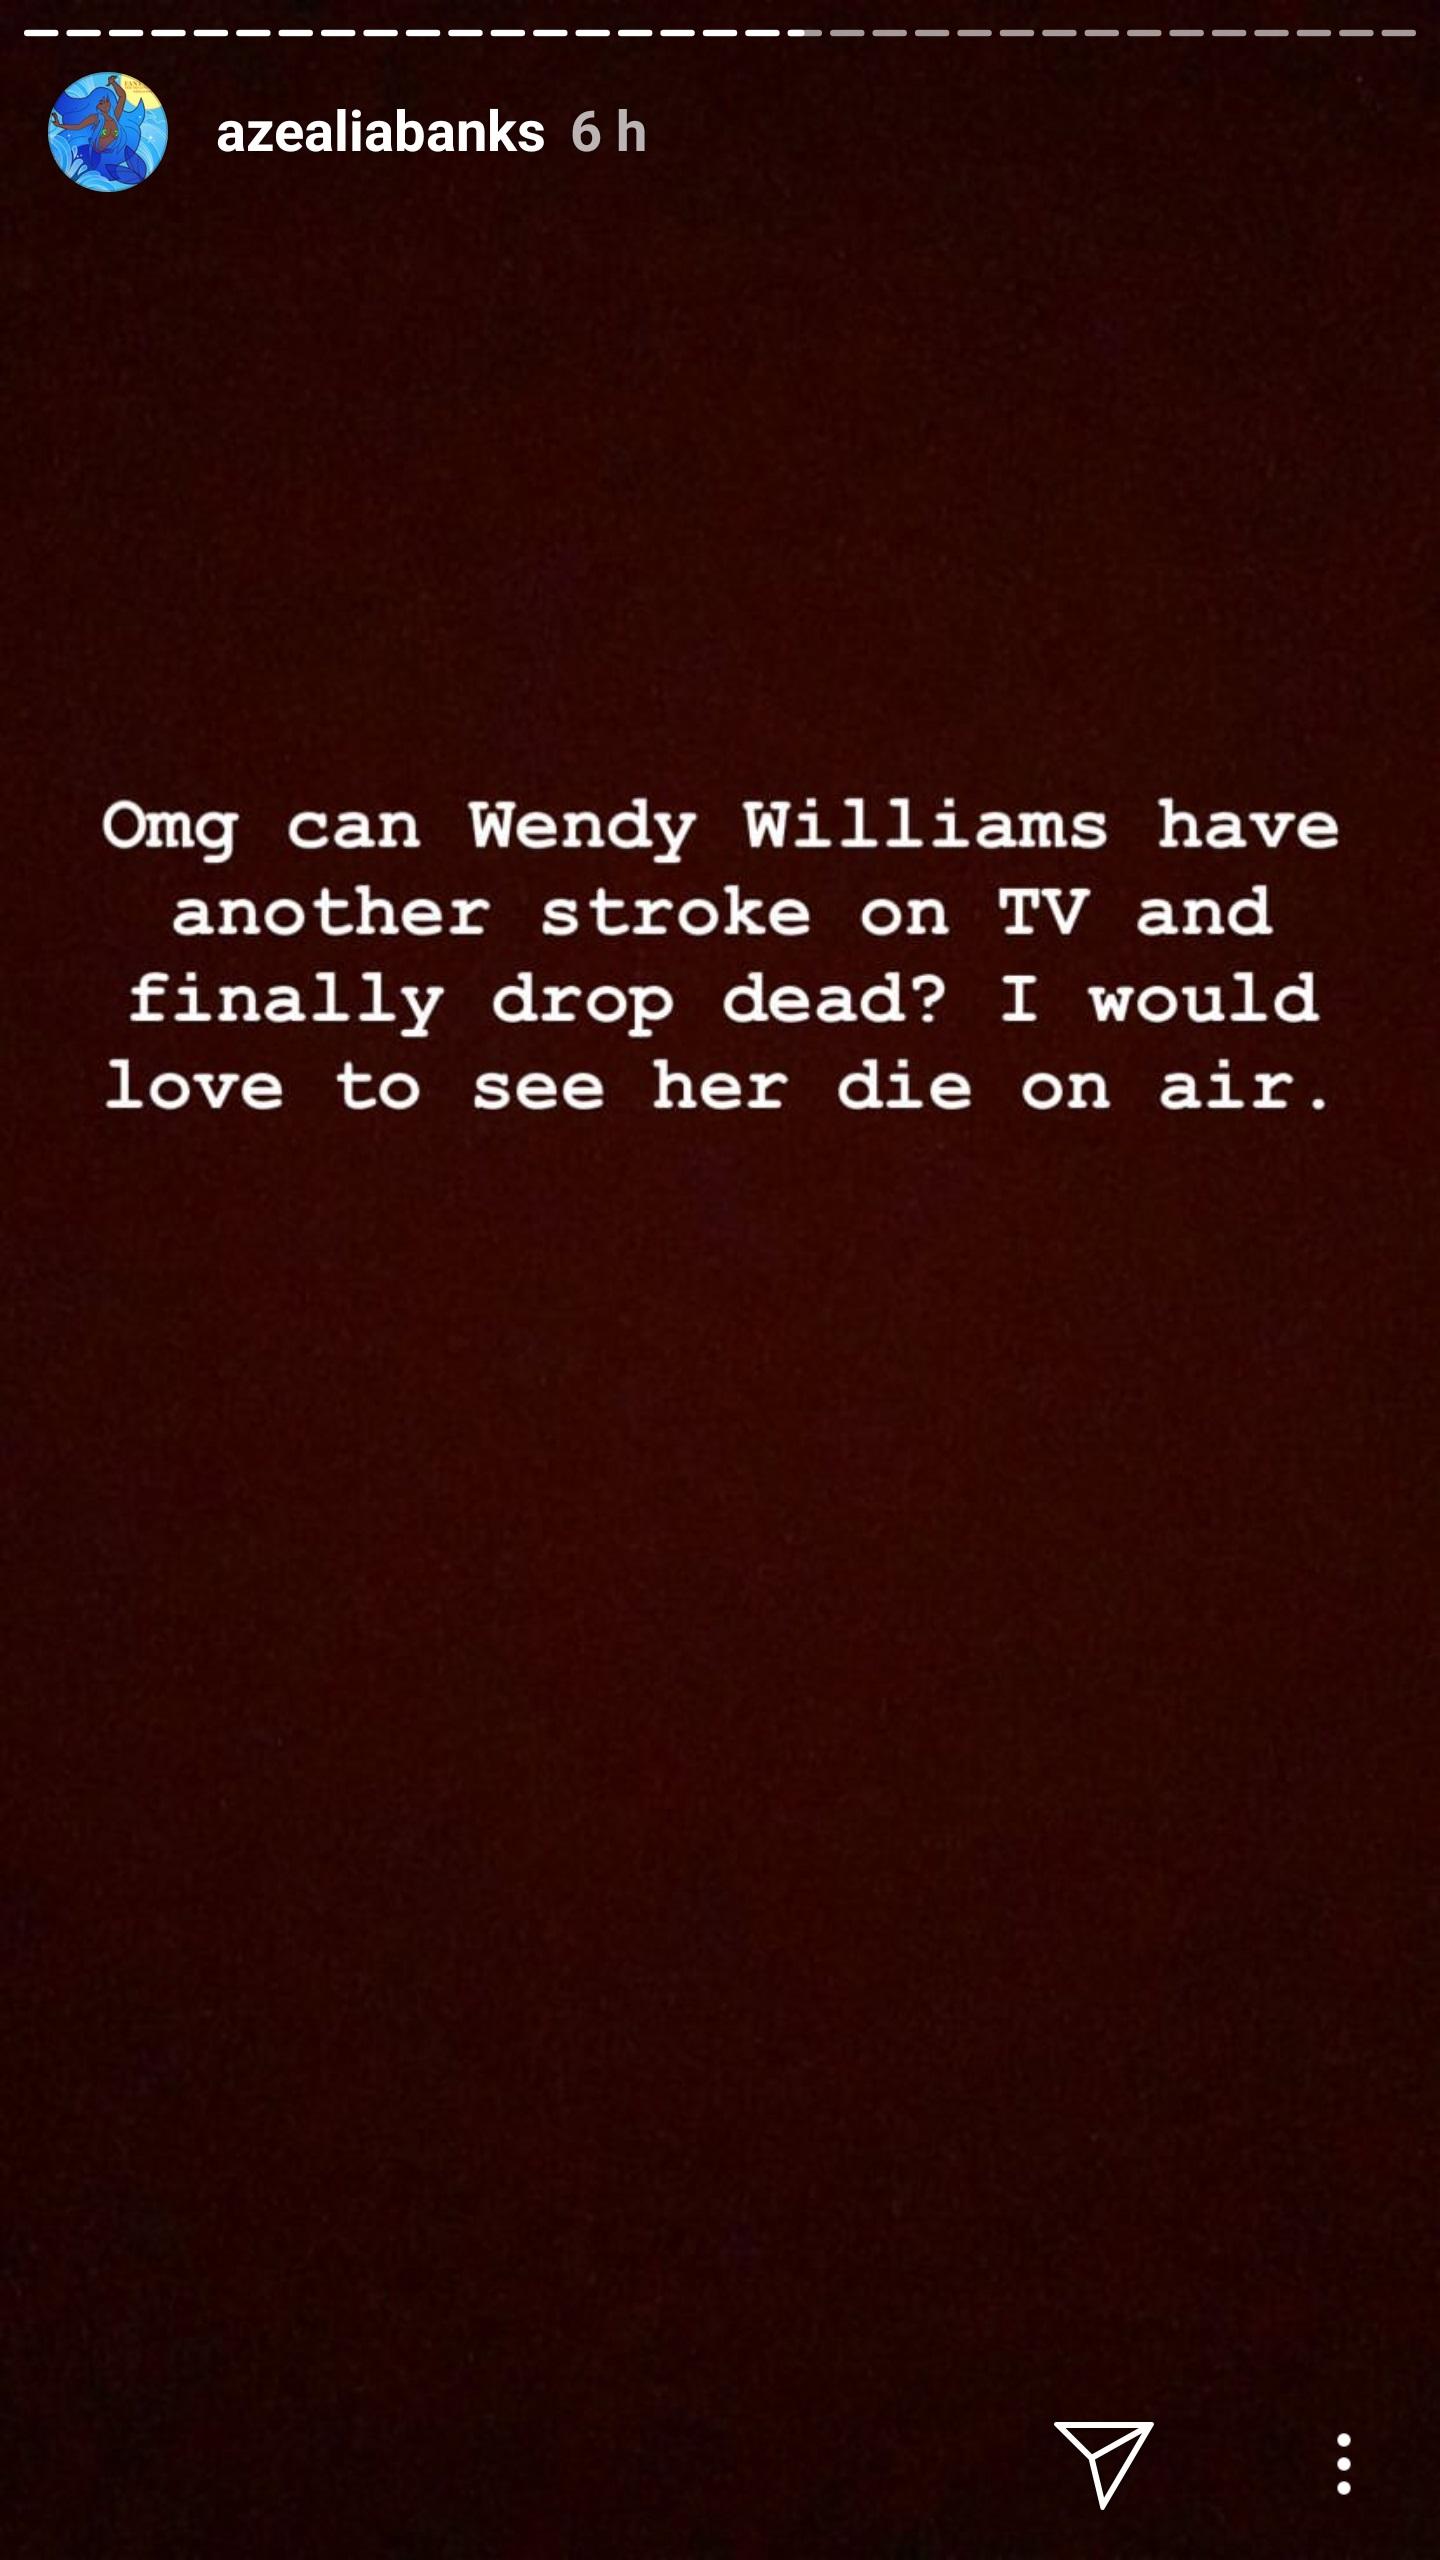 Azealia Banks Wants To See Wendy Williams Die On Air